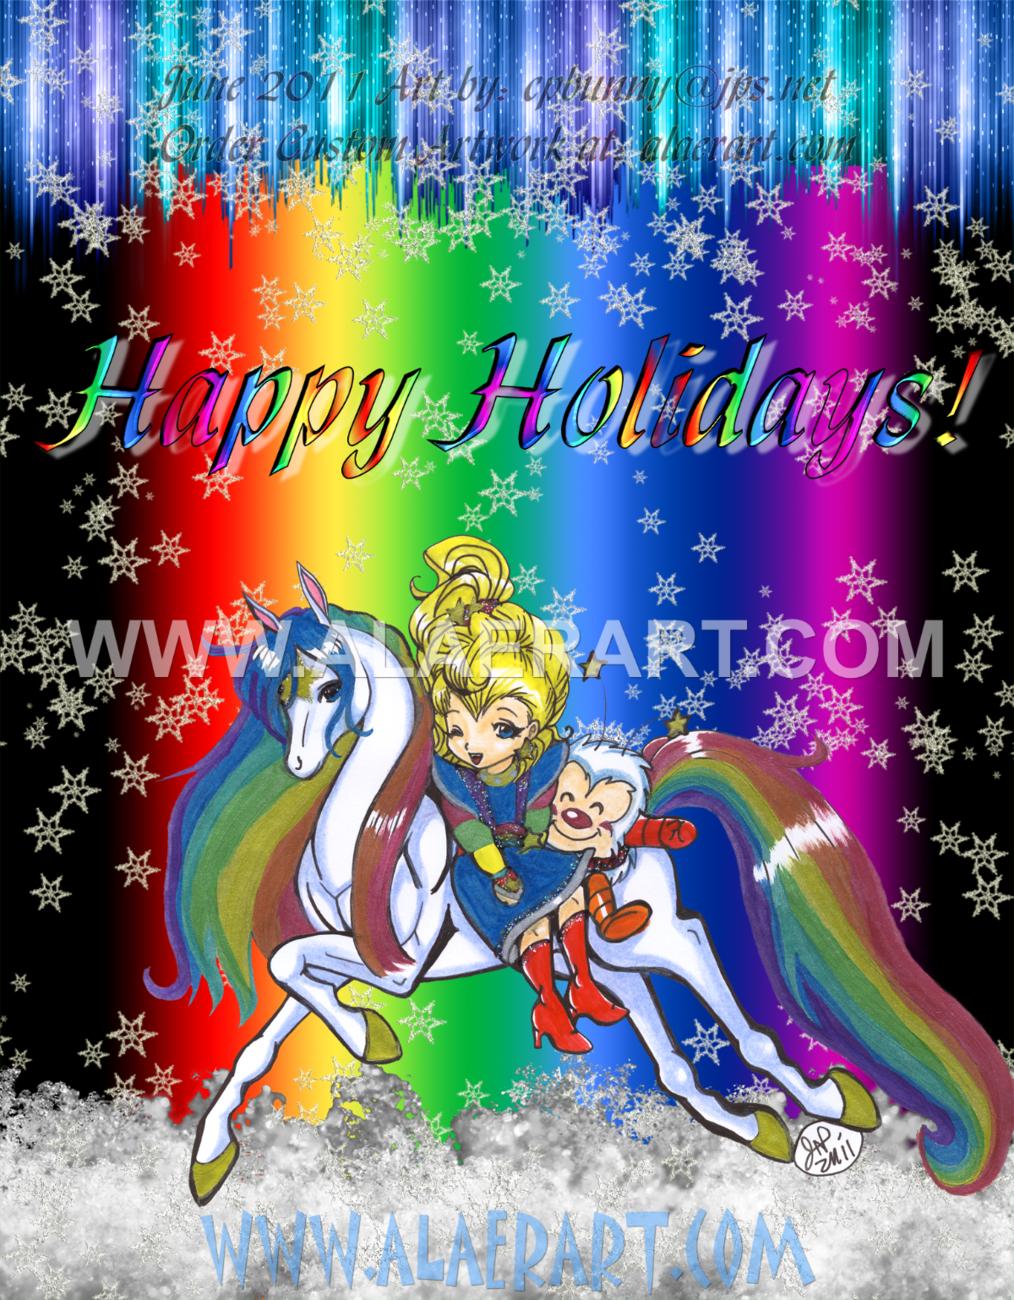 Rainbow Brite & Twink on Starlite Horse Classics Glossy Print Holiday Fan Art!